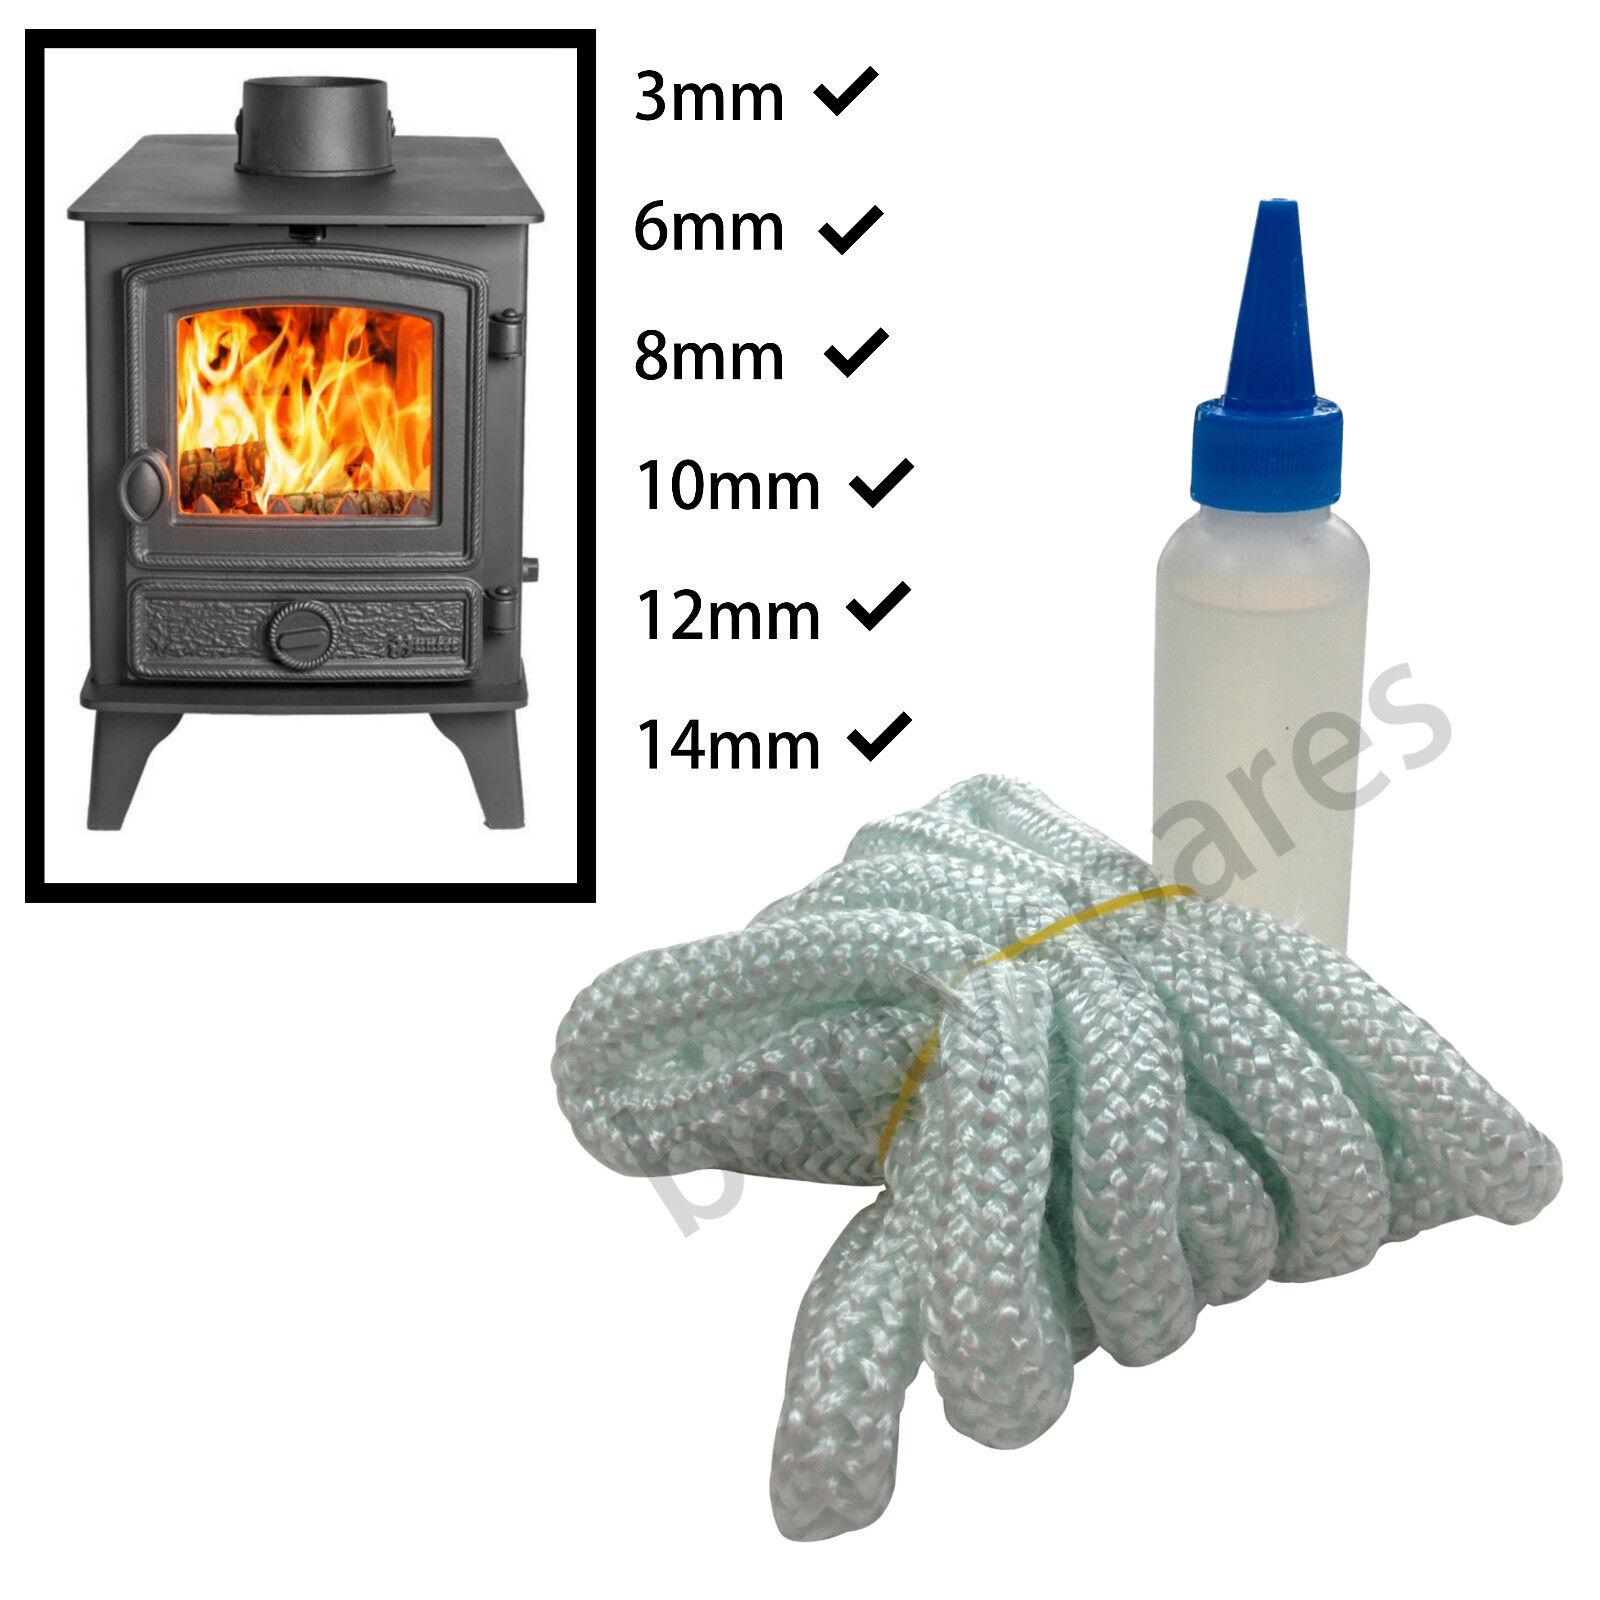 3m stove rope log wood burner door gasket seal glass fire for 14mm stove door rope